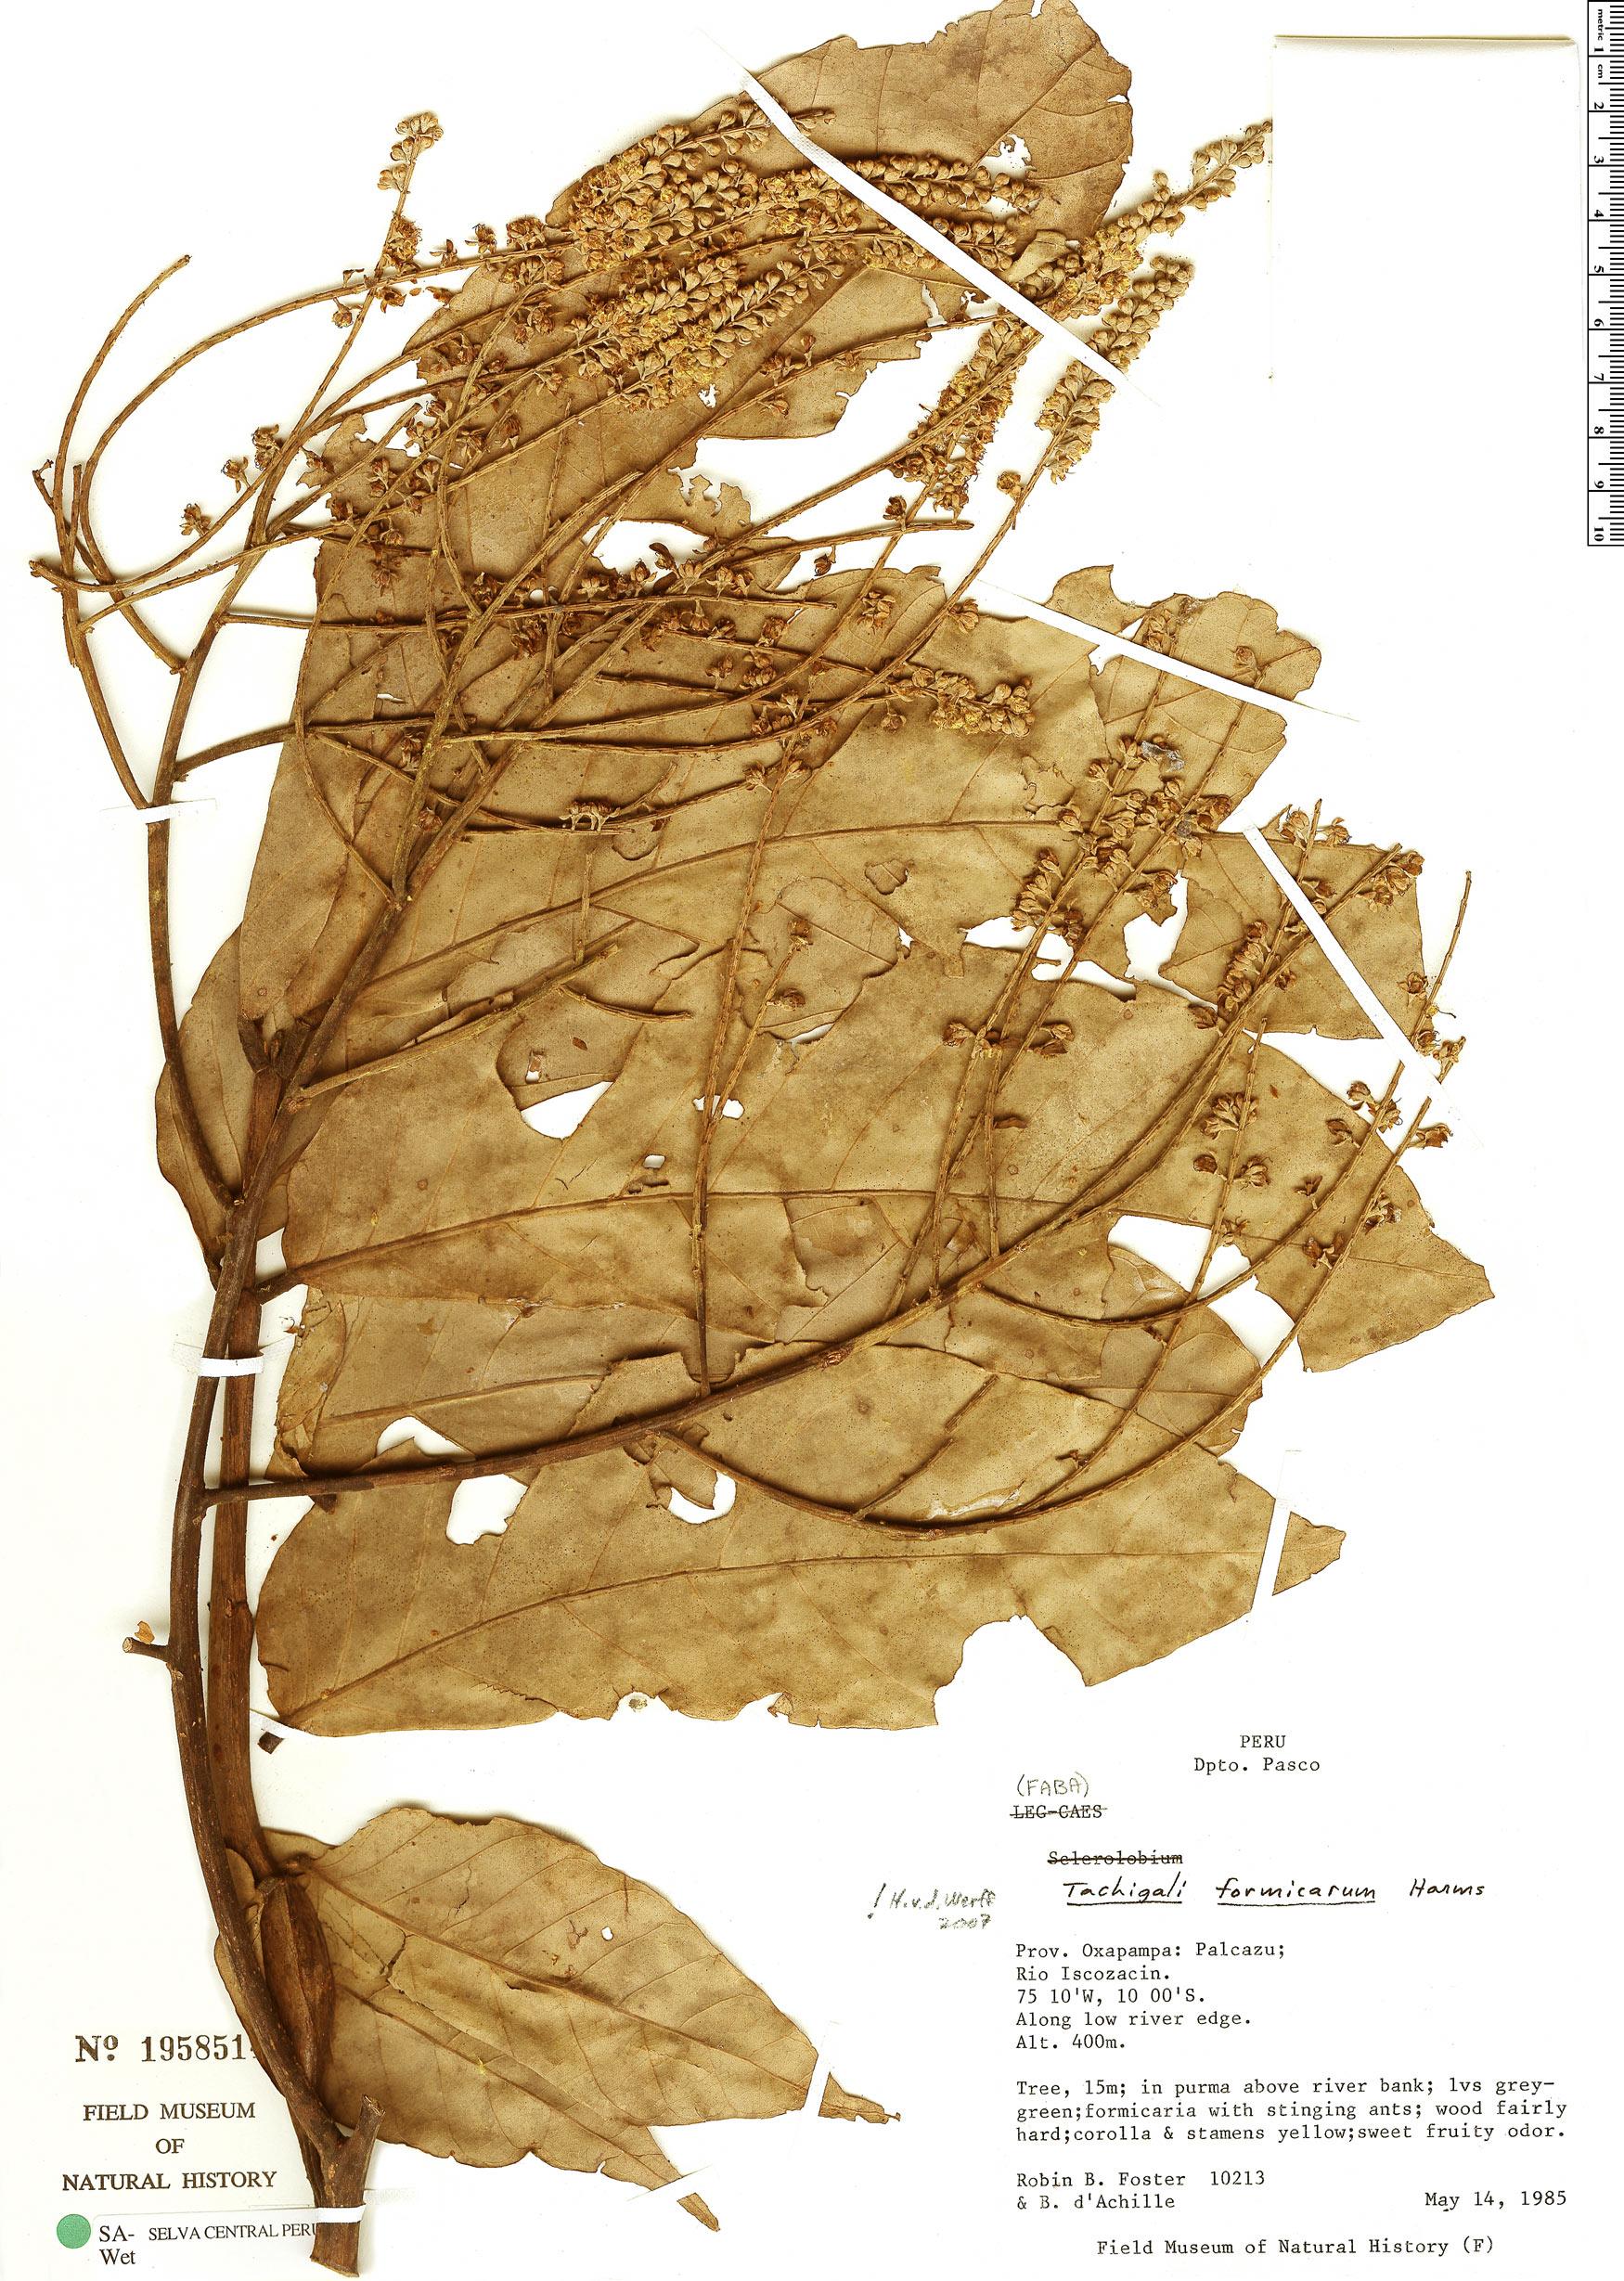 Specimen: Tachigali formicarum